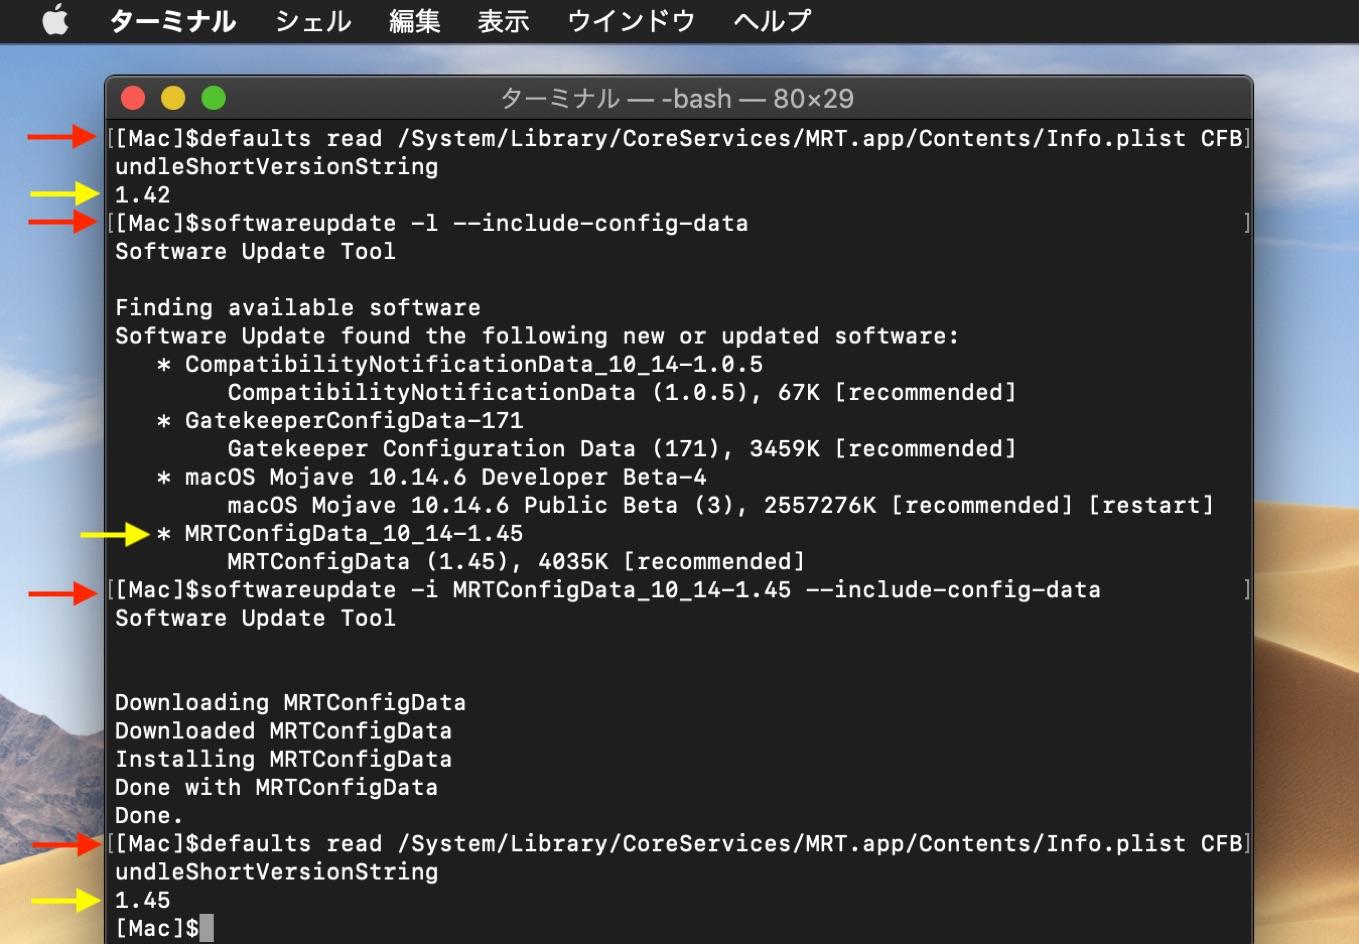 softwareupdate MRTConfigData v1.45